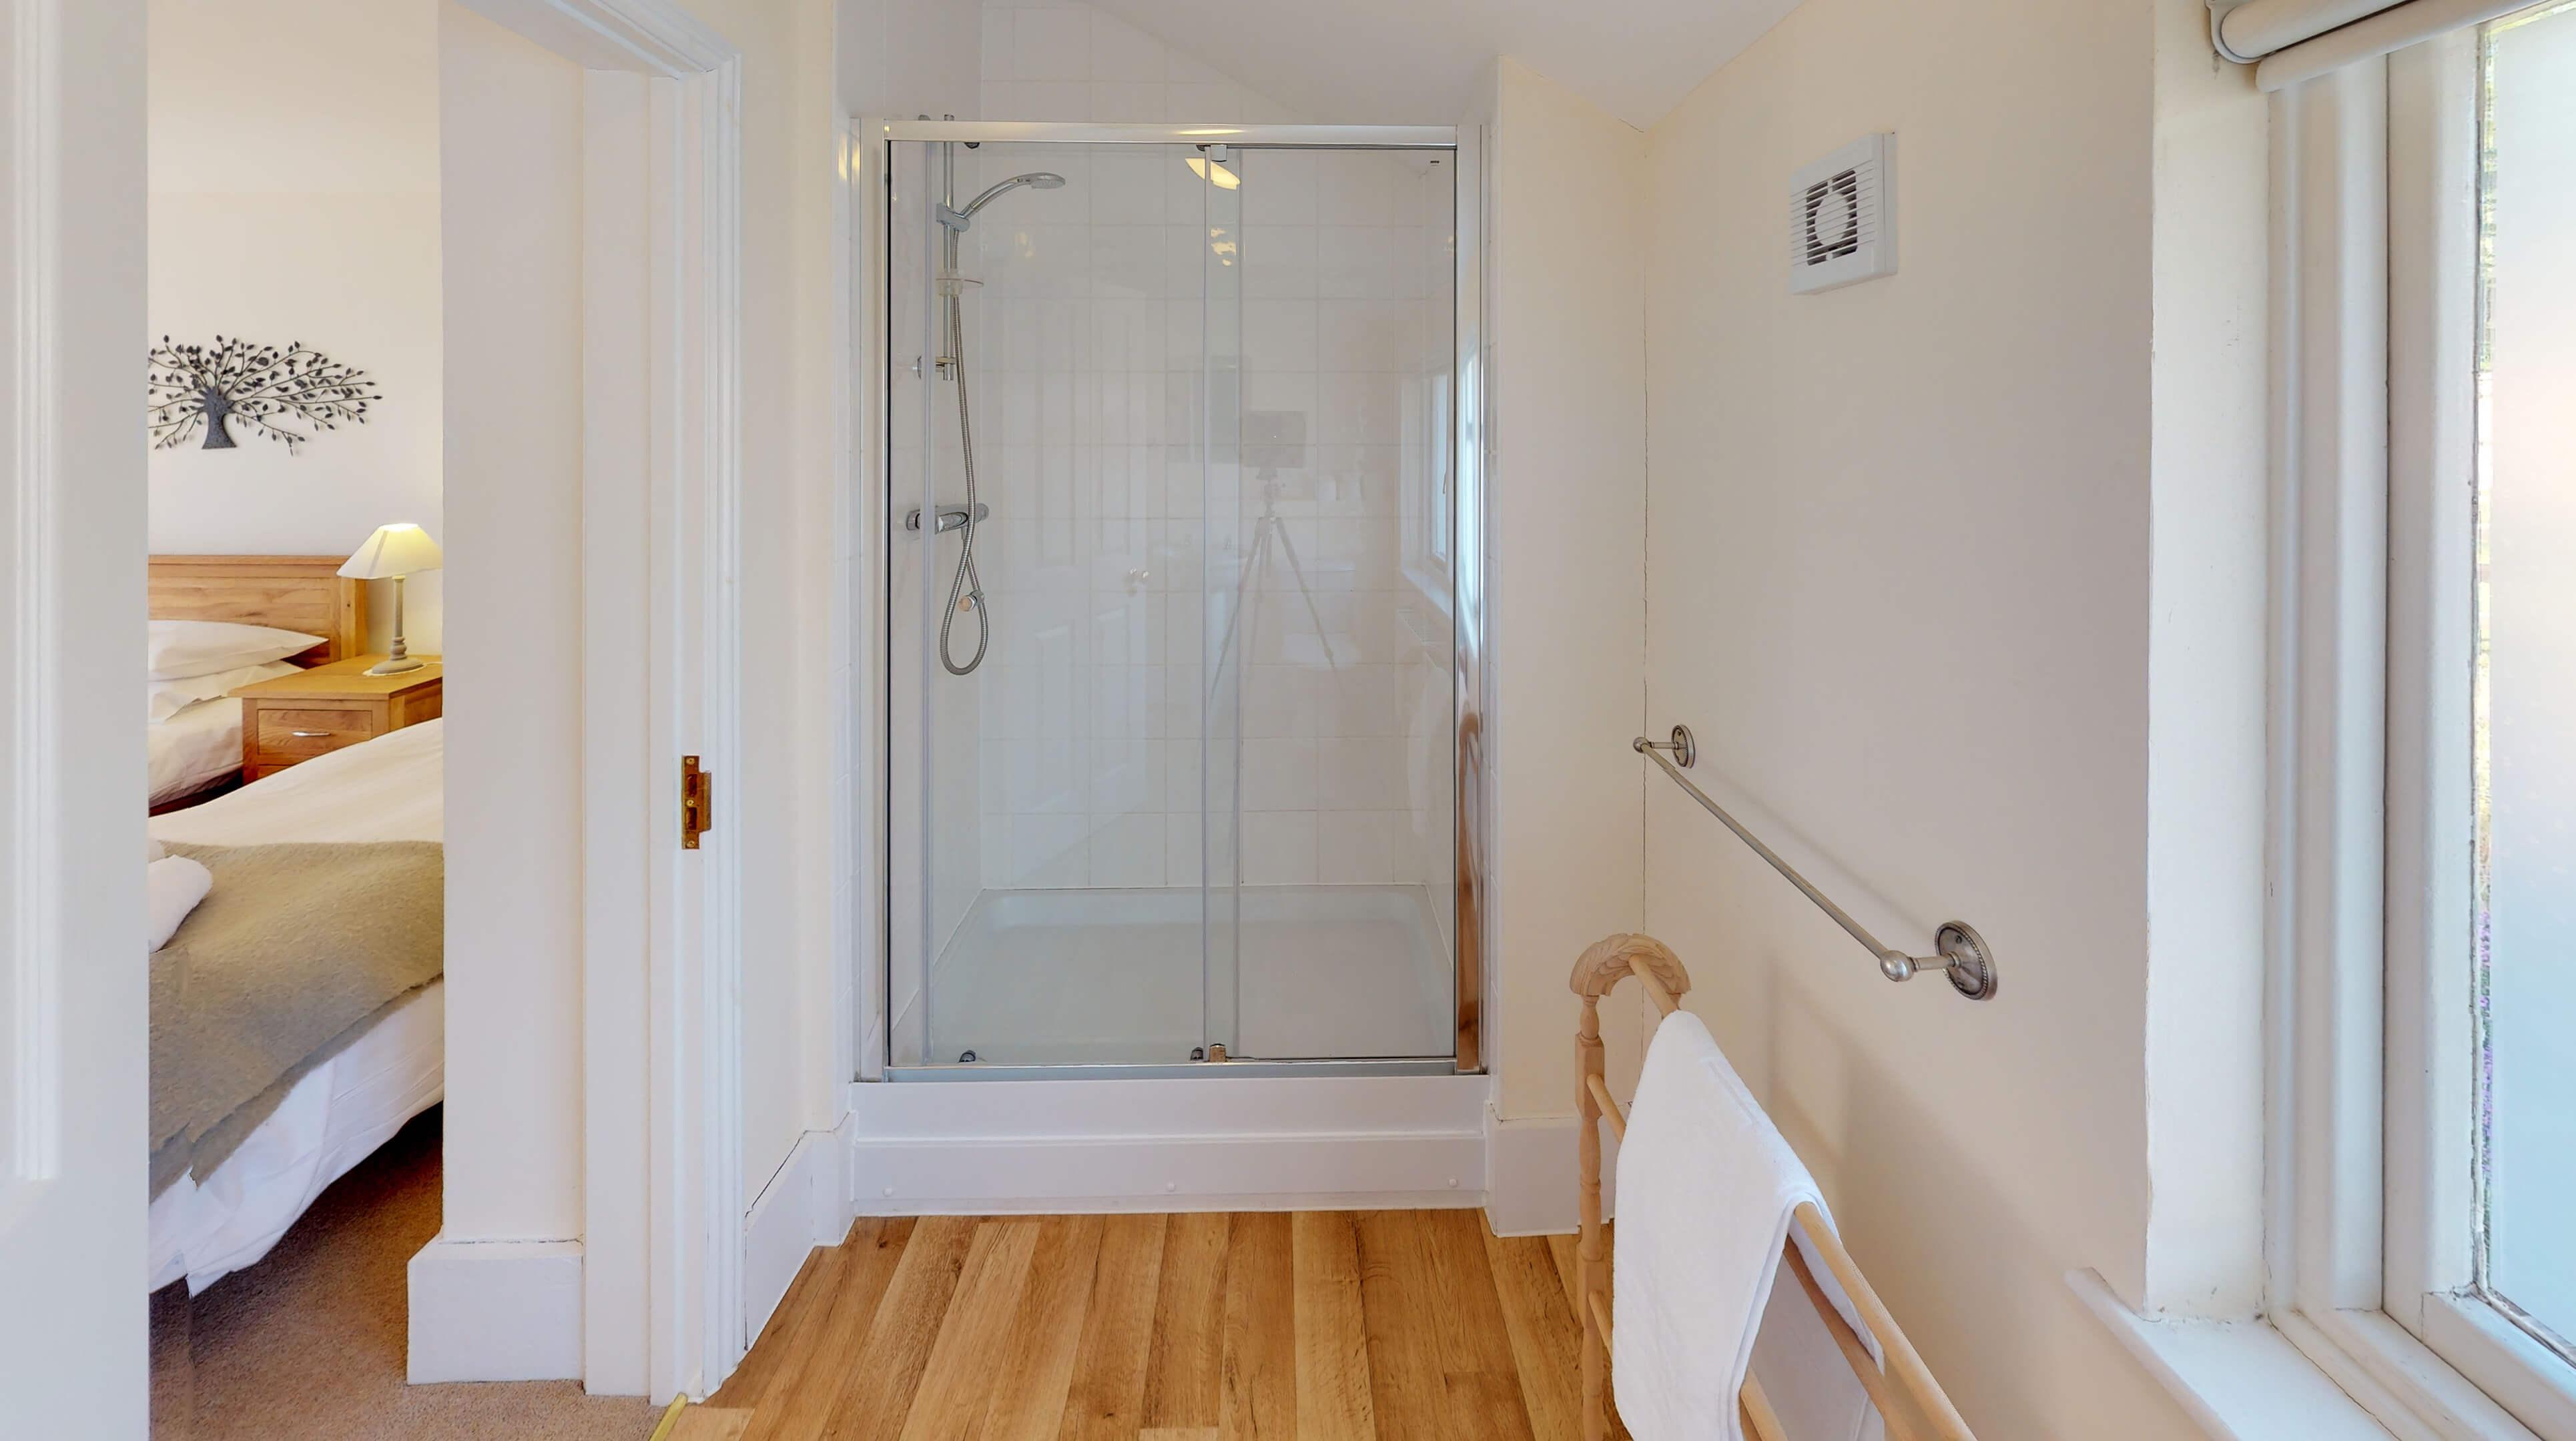 Bladon Two Bedroom Home Farm Cottage Bathroom 1